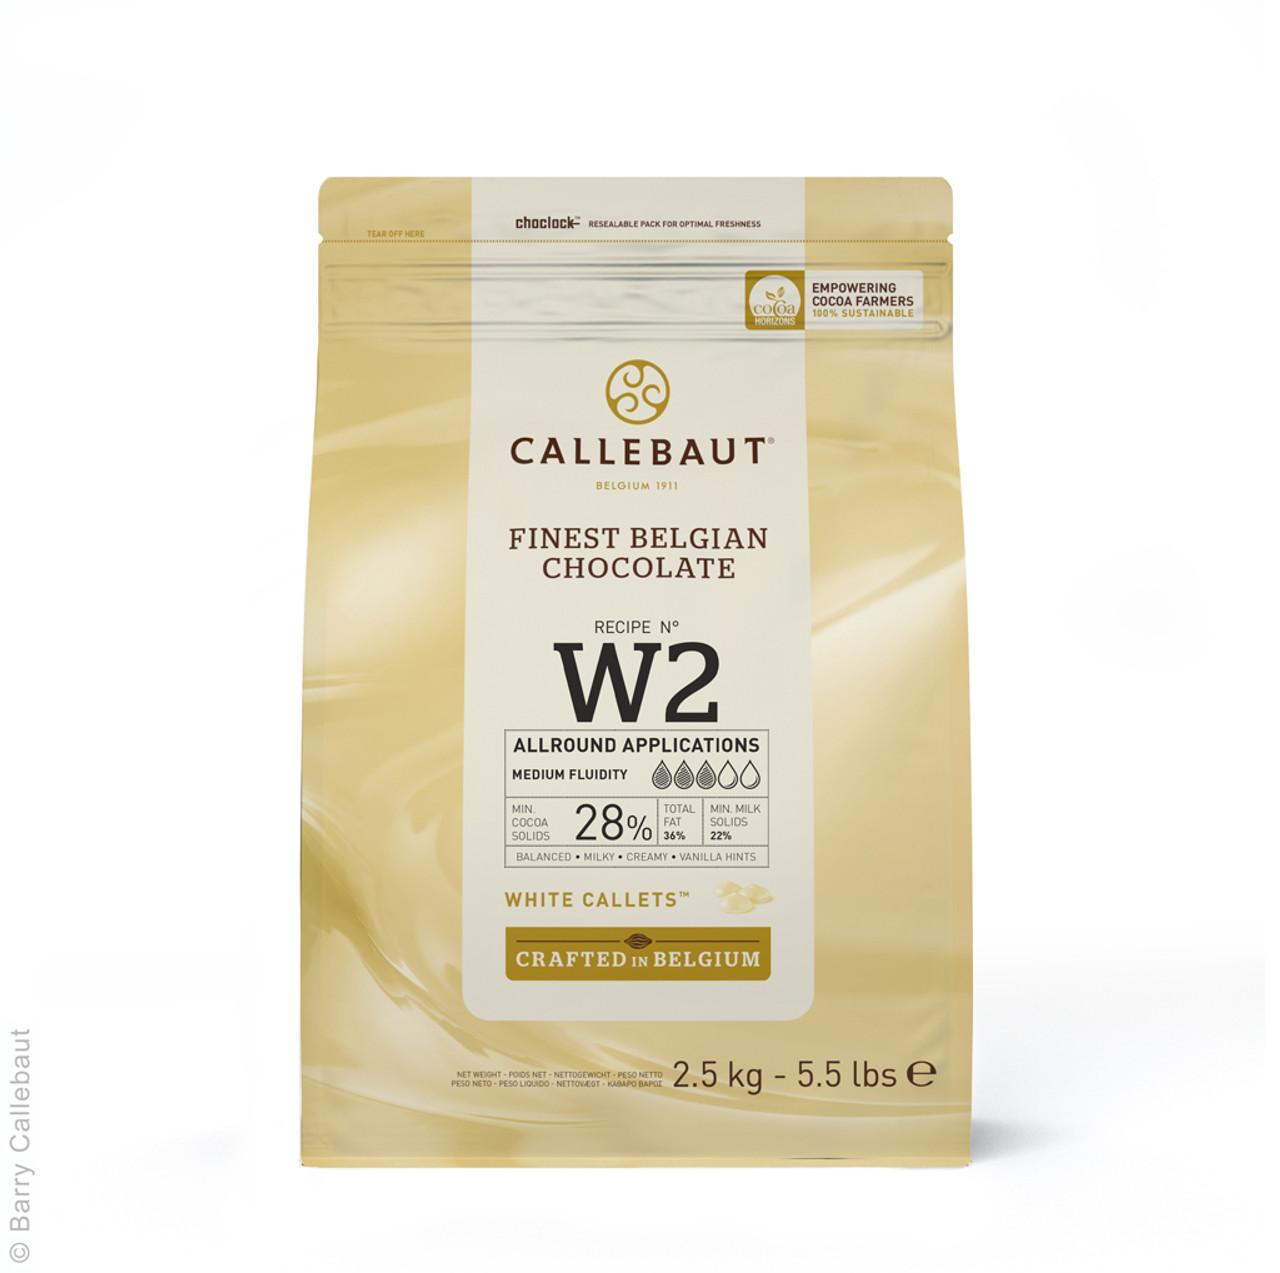 CALLEBAUT WHITE CALLETS 28% 1kg